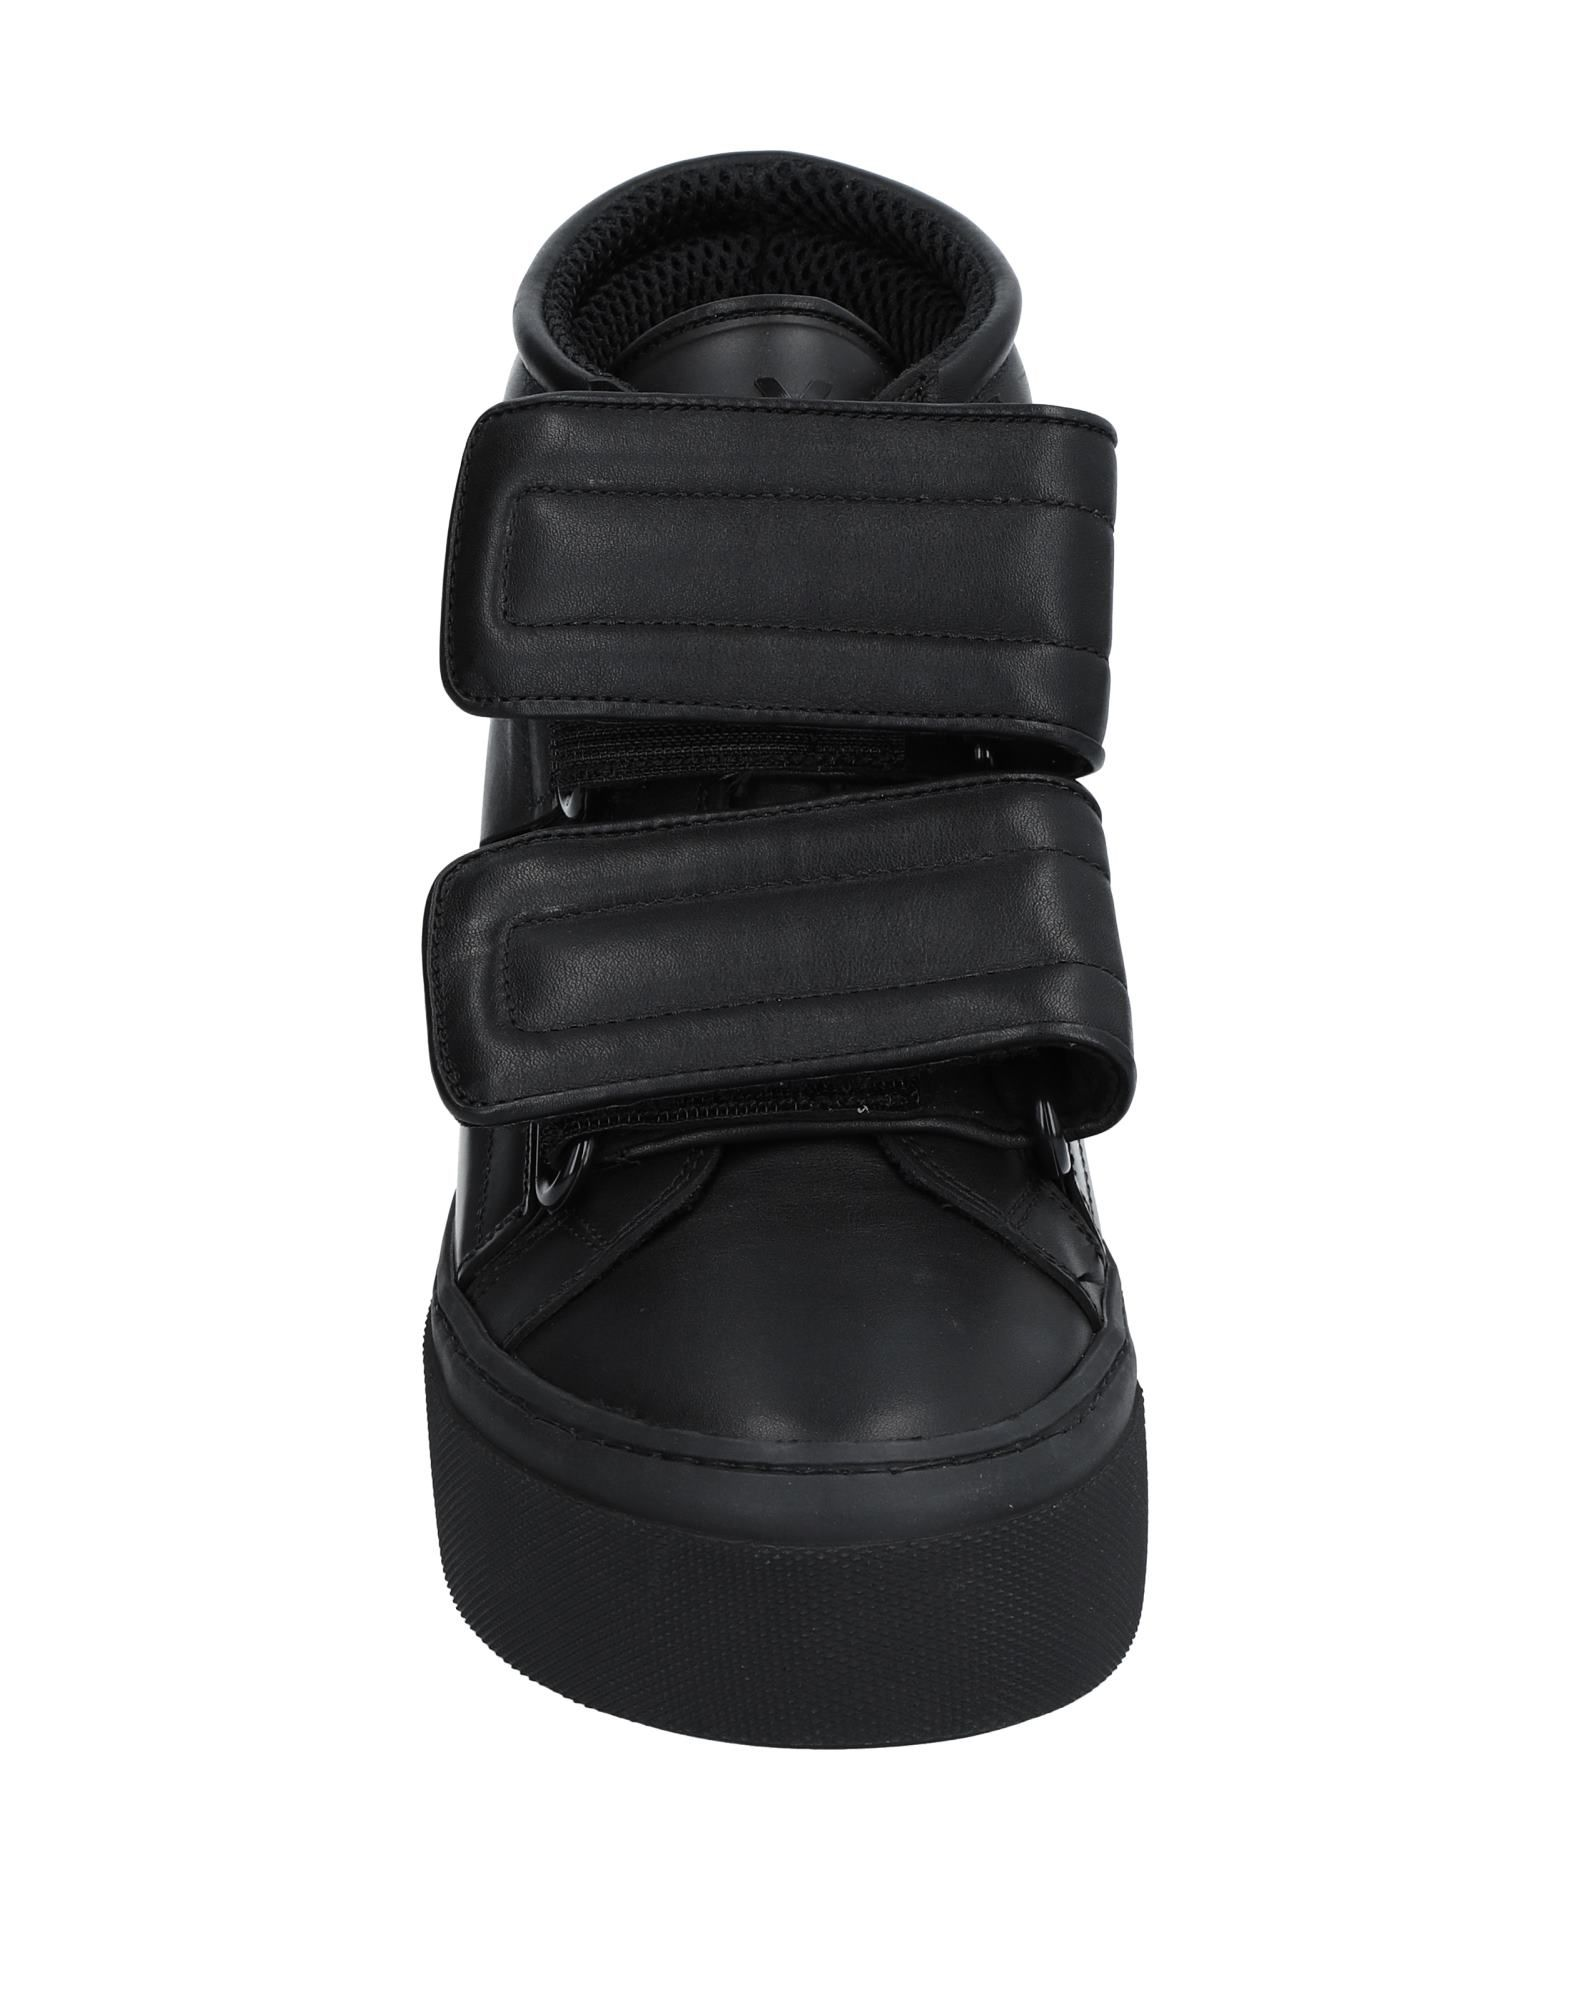 O.X.S. Sneakers Damen   Damen 11533658ER Heiße Schuhe f3ab81